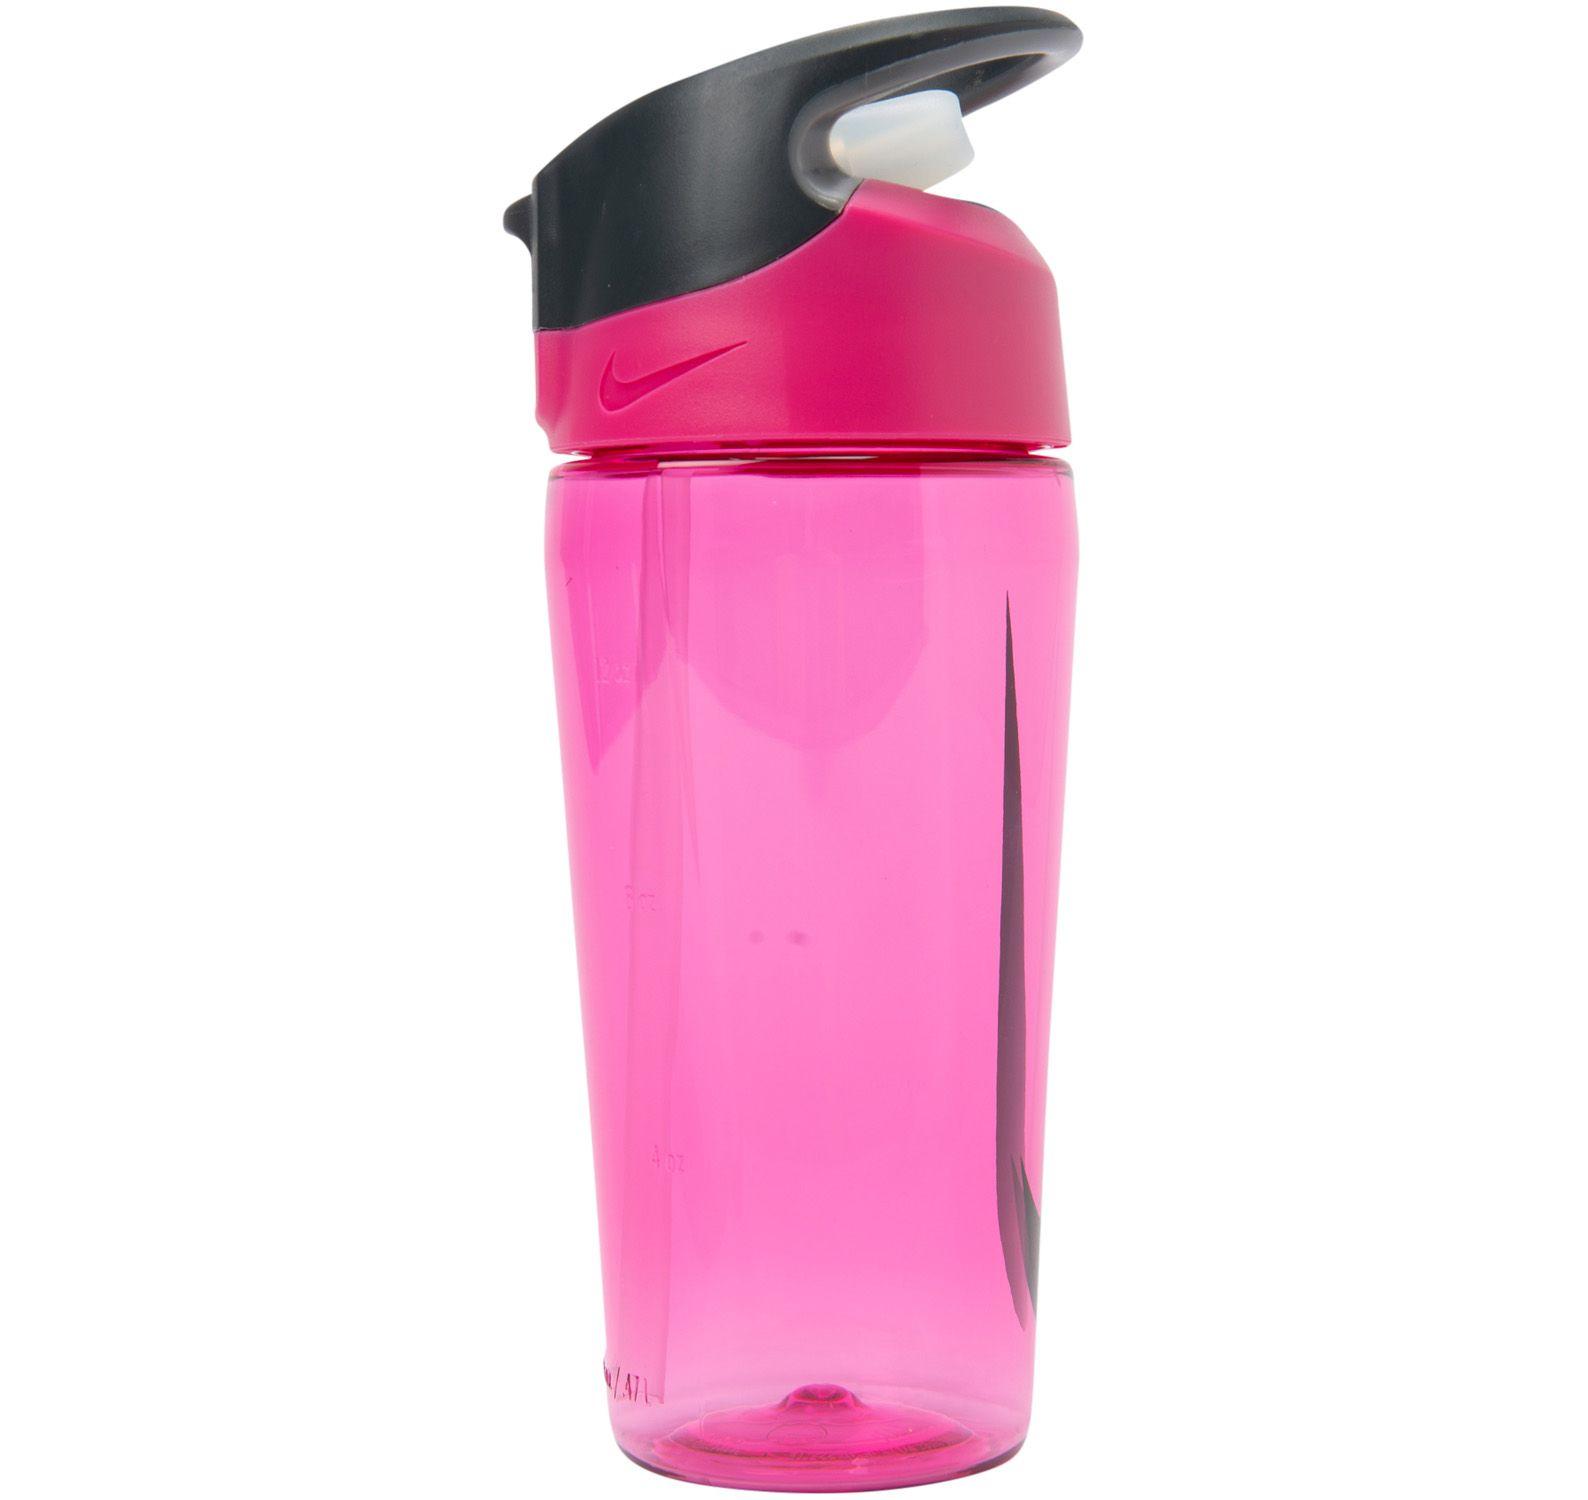 Nike Tr Hypercharge Straw Bott, Vivid Pink/Cool Grey/Black, 400, Nike